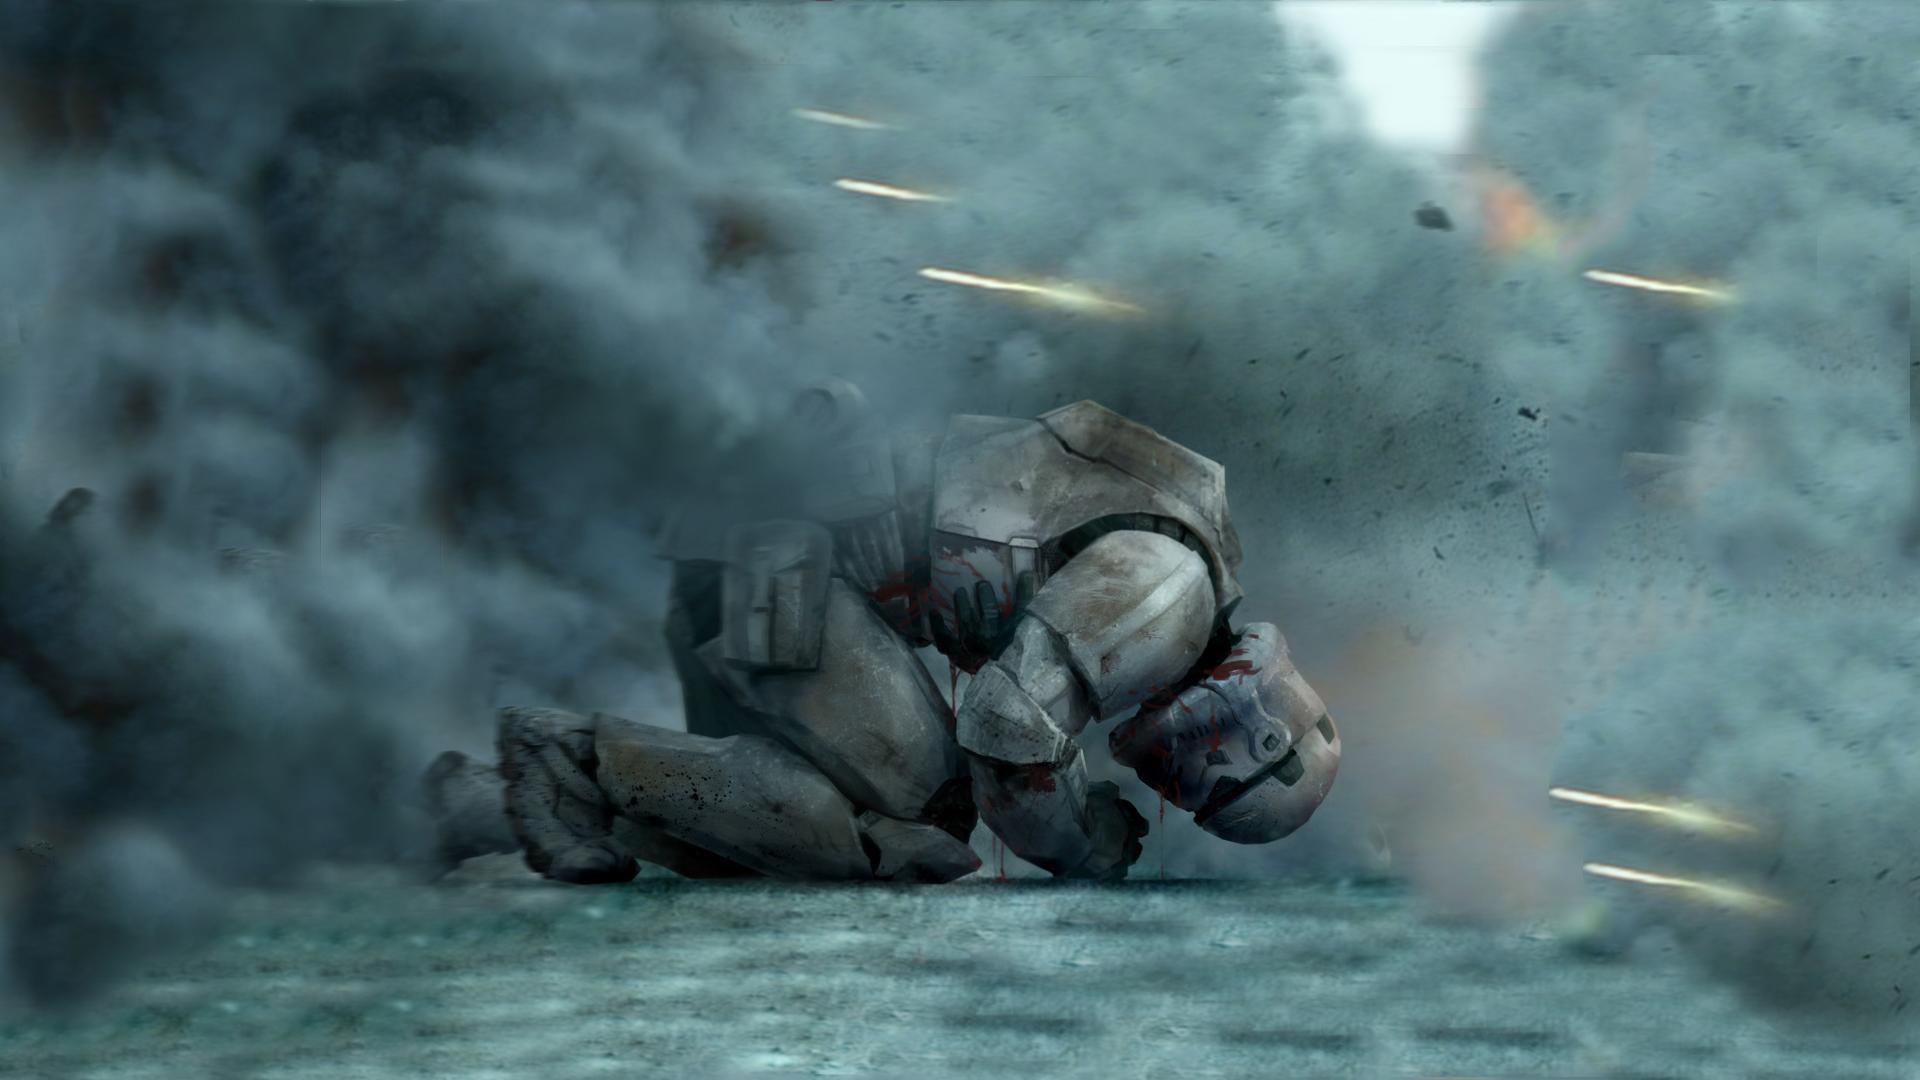 Star Wars Wallpaper Hd - Star Wars Stormtrooper Dying , HD Wallpaper & Backgrounds